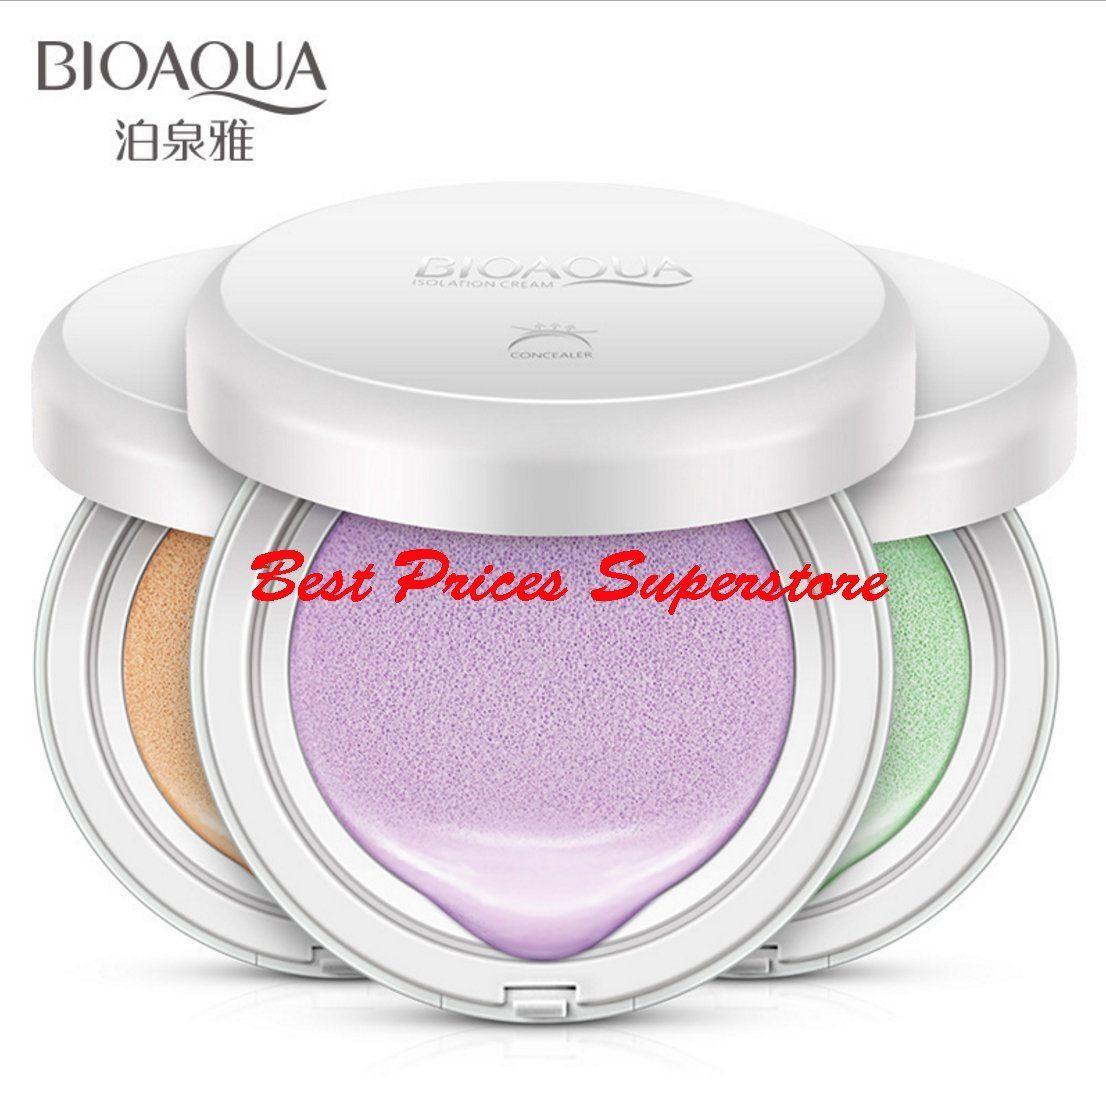 Bioaqua Natural Bb Makeup Bronzer Liqid Isolation Cream Air